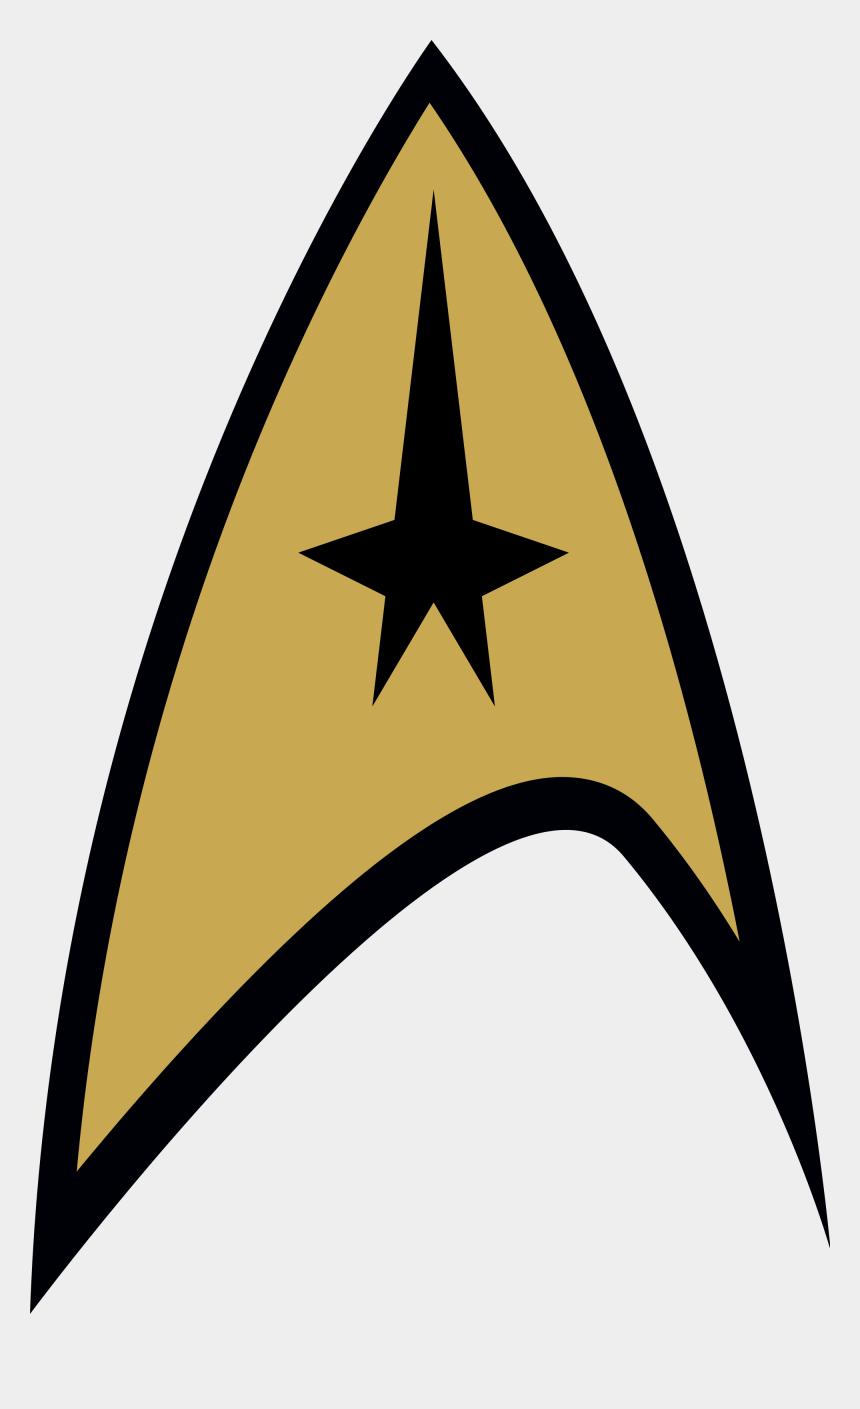 star trek enterprise clipart, Cartoons - Uss Enterprise Patch - Printable Star Trek Badge